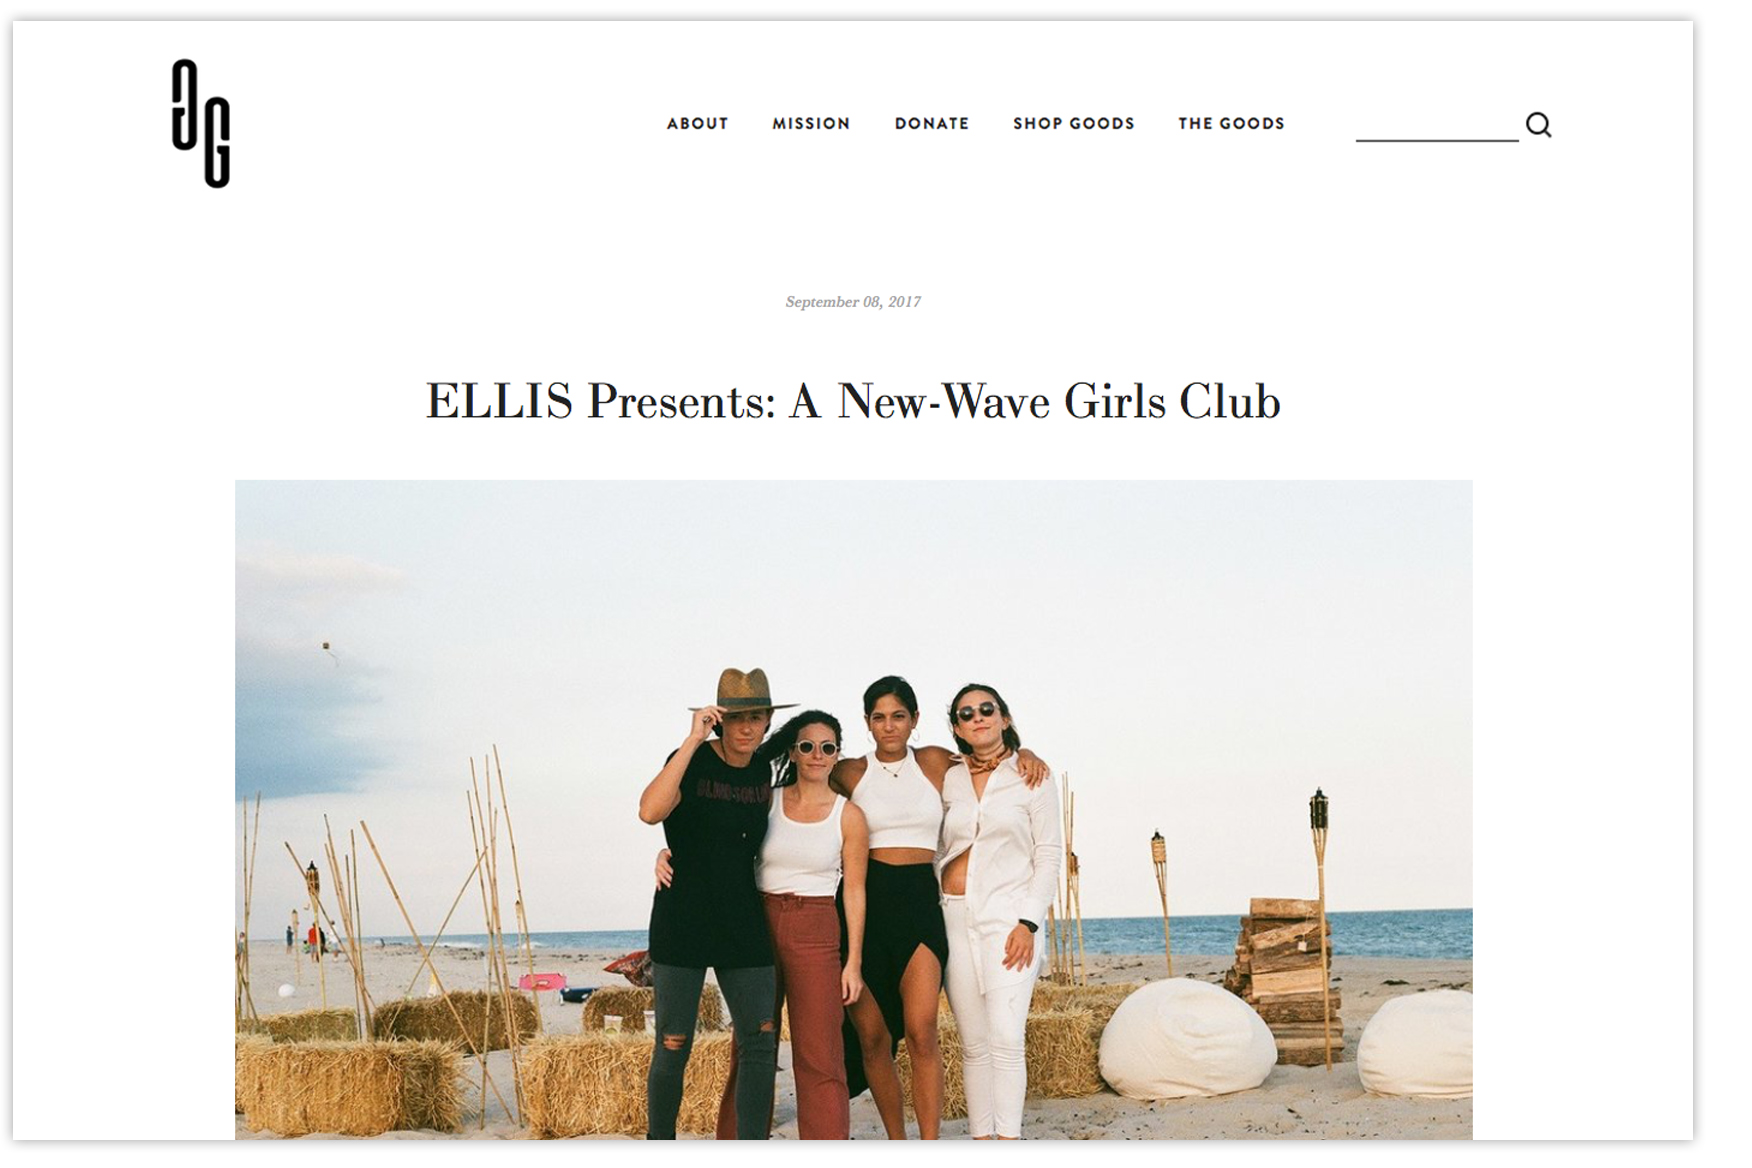 Ellis presents Good for Girls magazine The New Nightlife community for Women.jpg